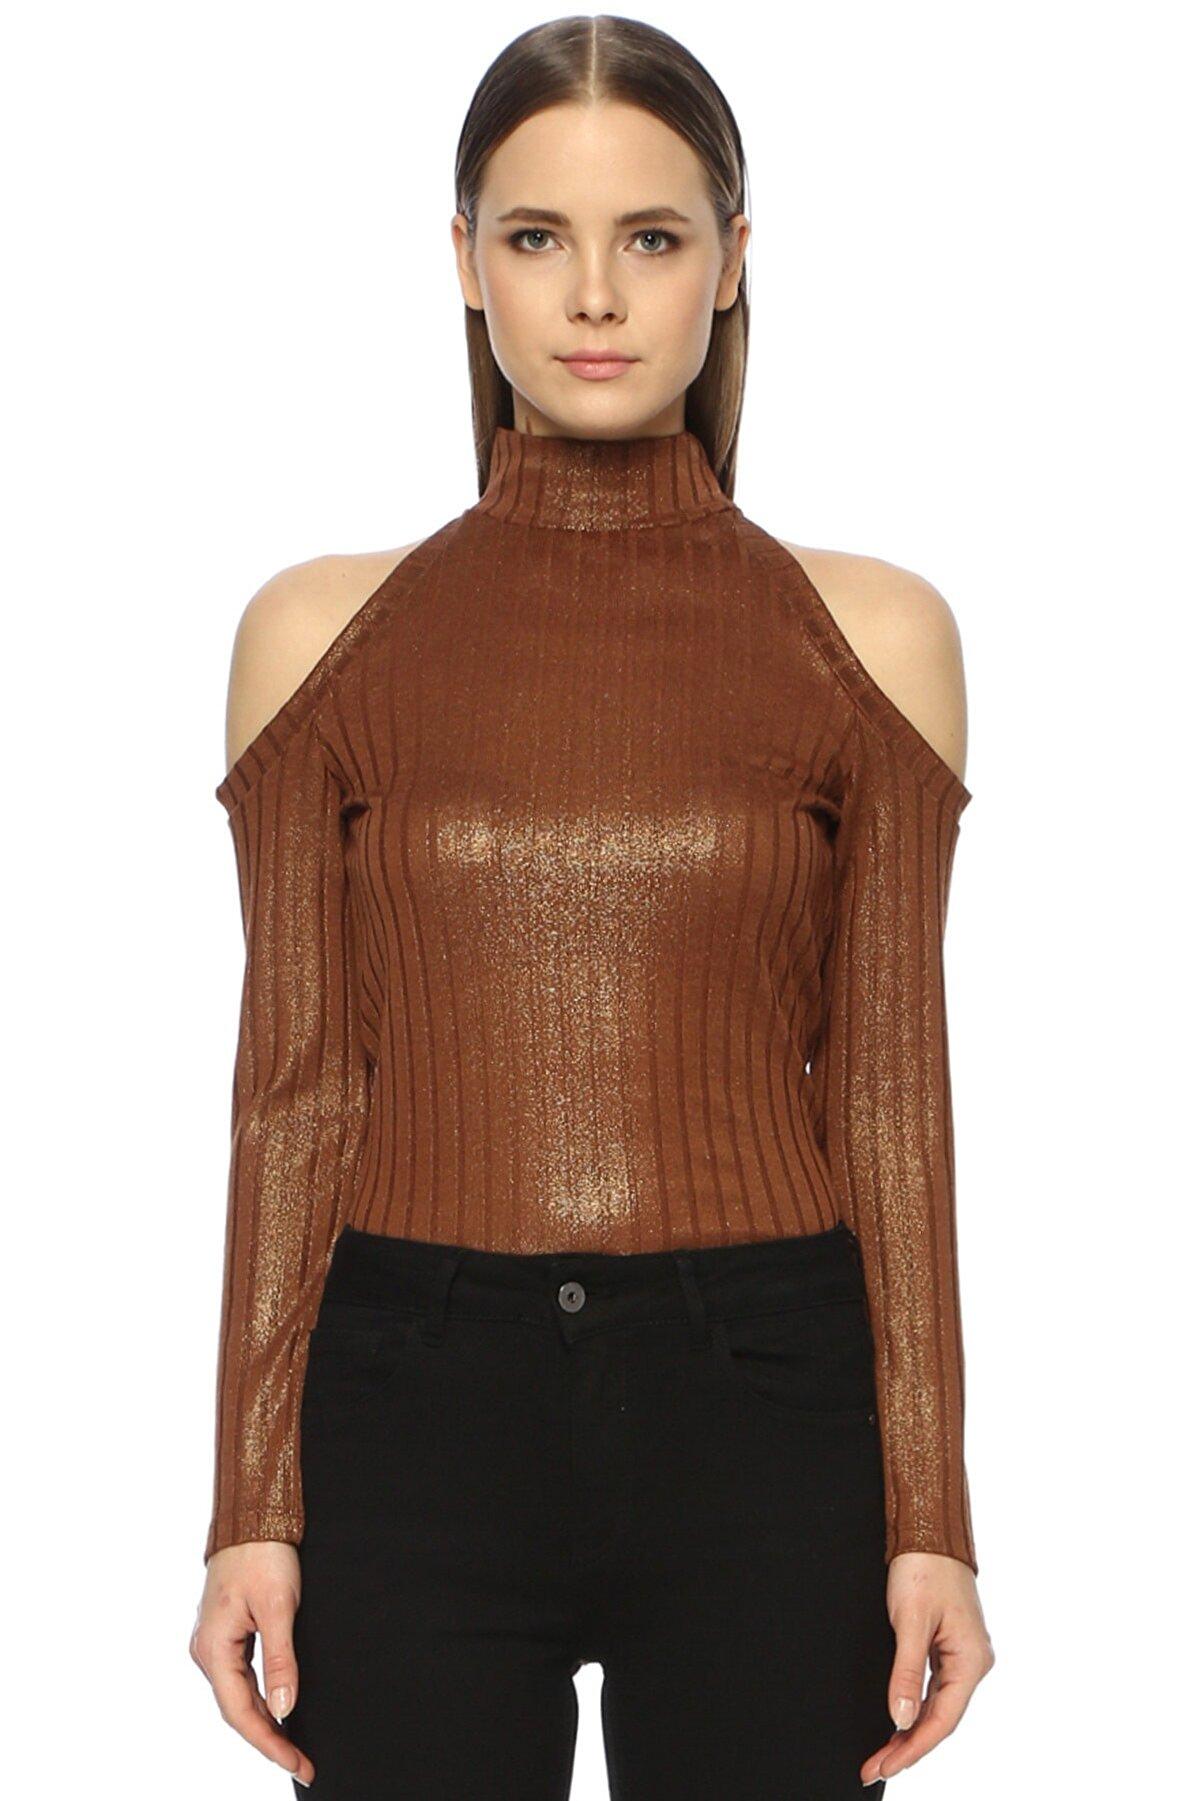 Network Kadın Slim Fit Bakır Tshirt 1071041